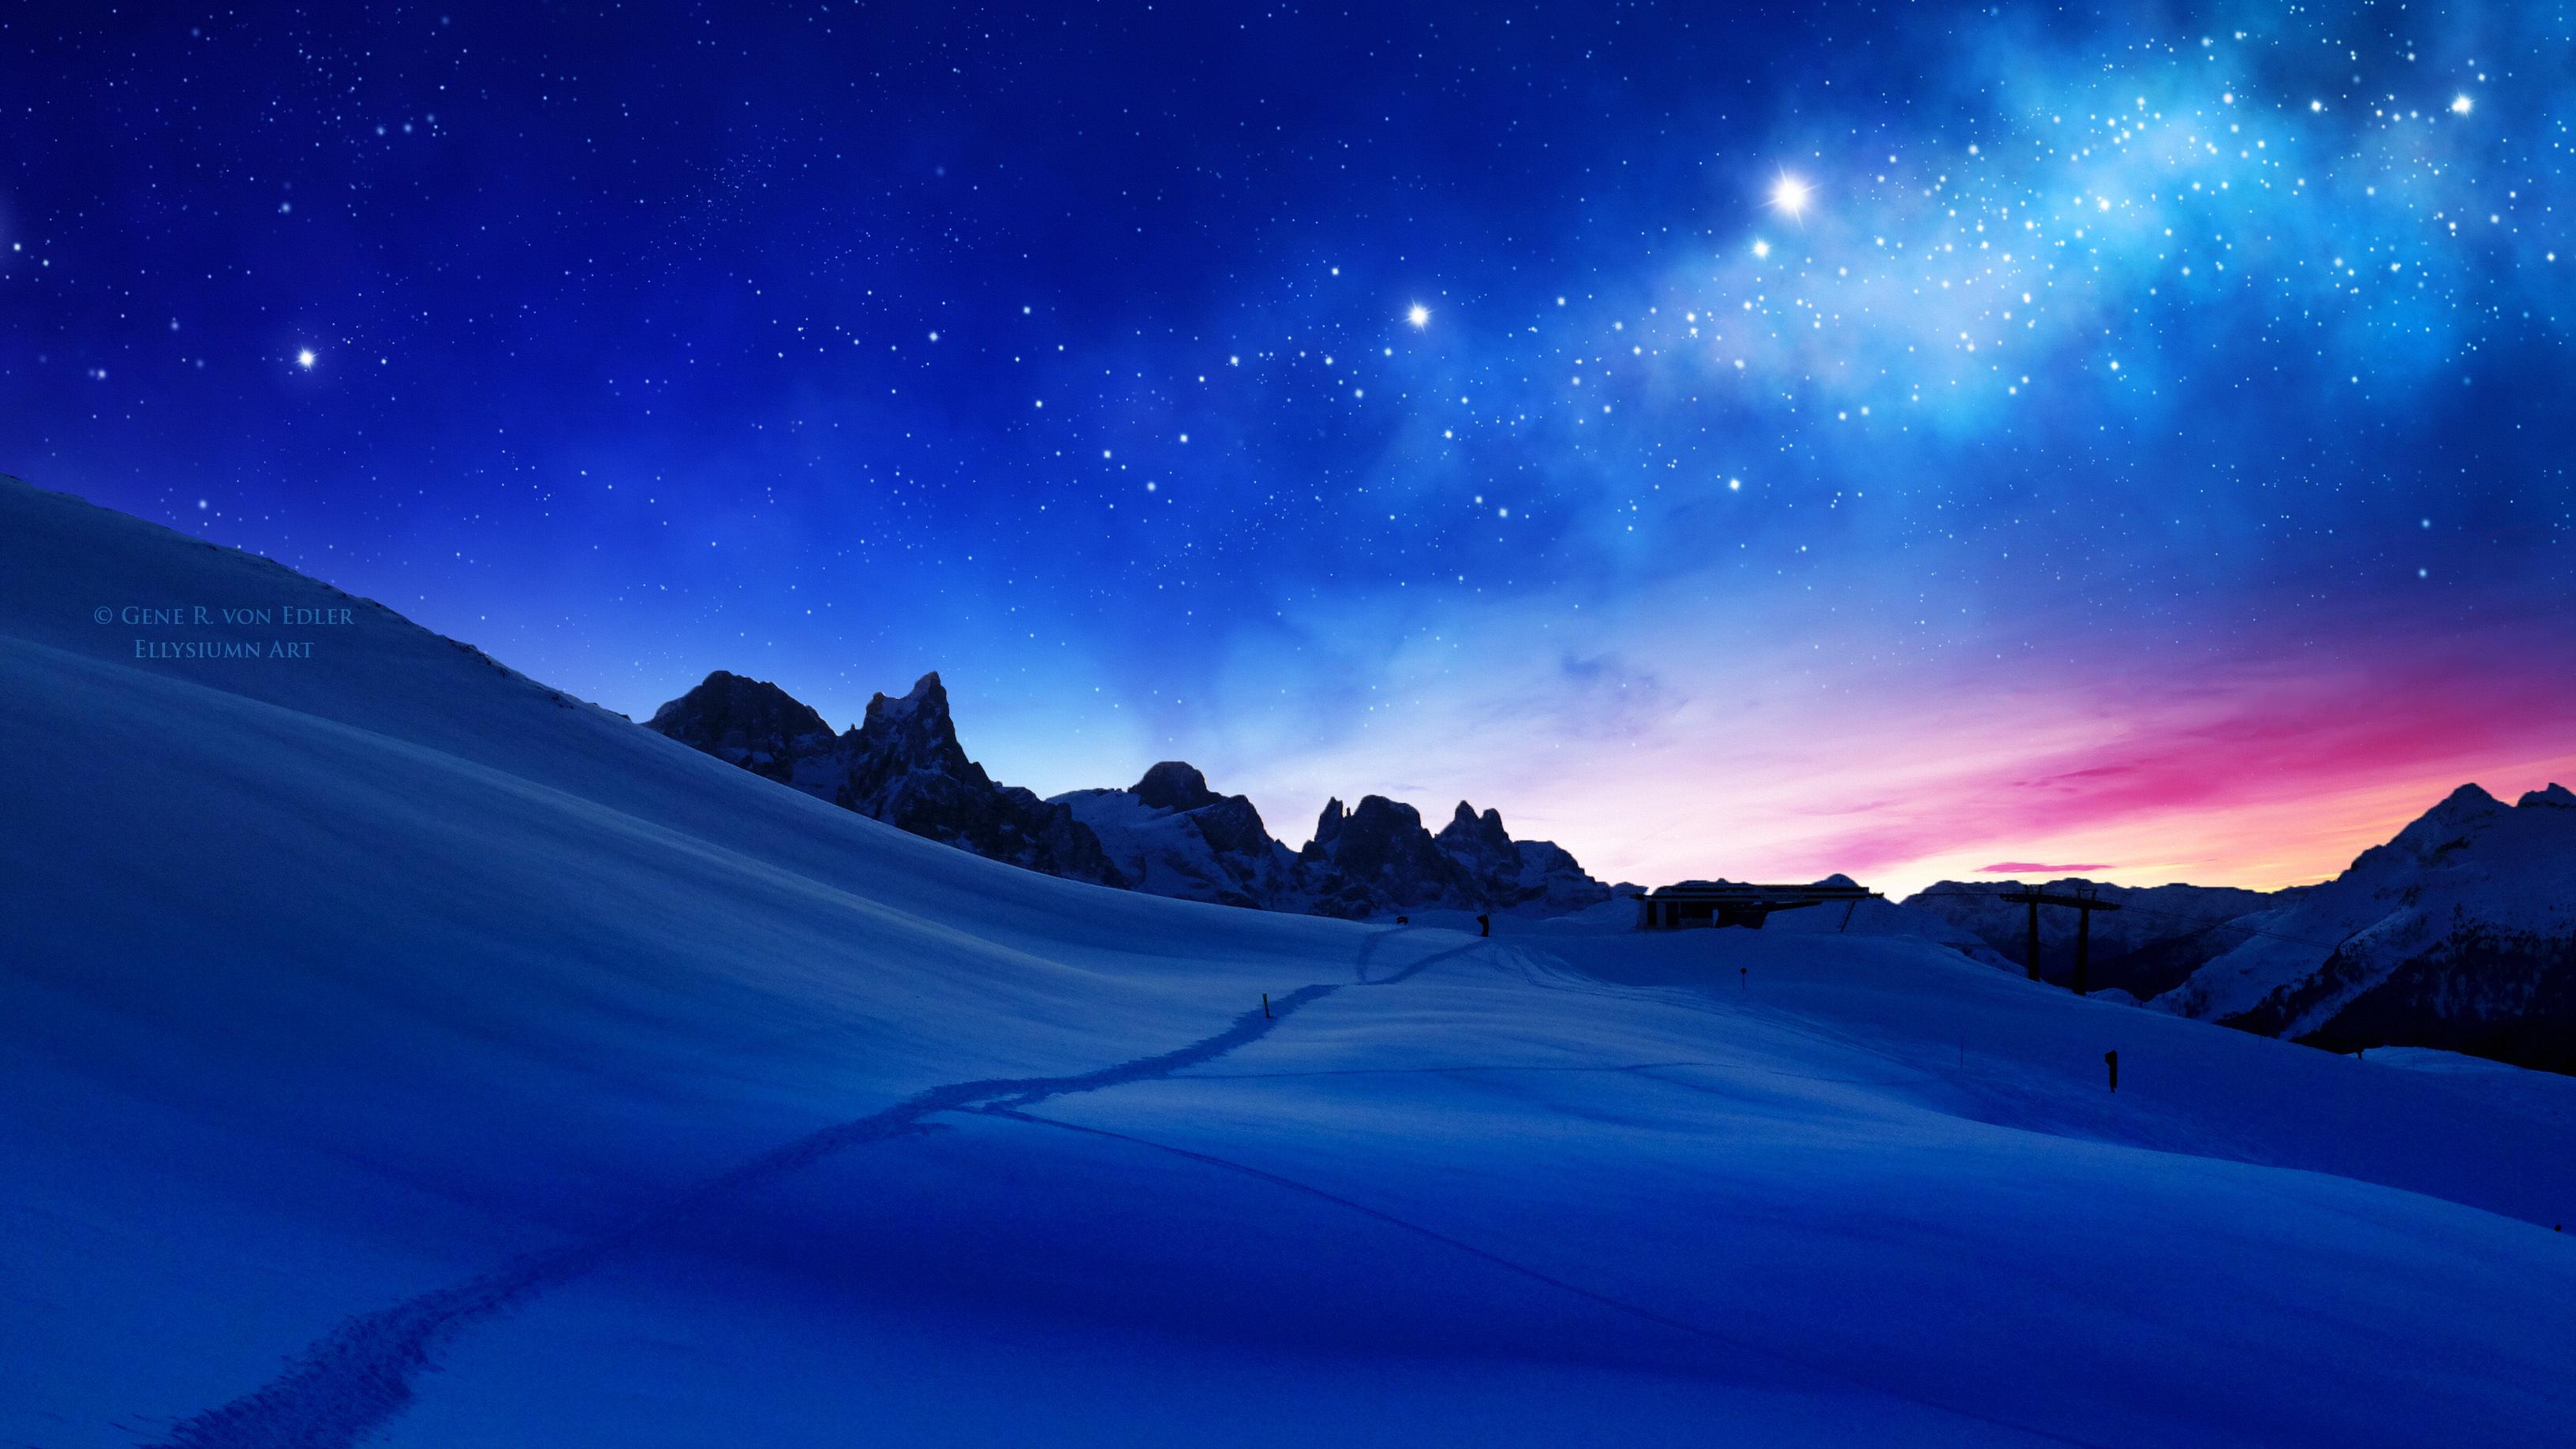 1366x768 Blue Cool Sunset 1366x768 Resolution HD 4k